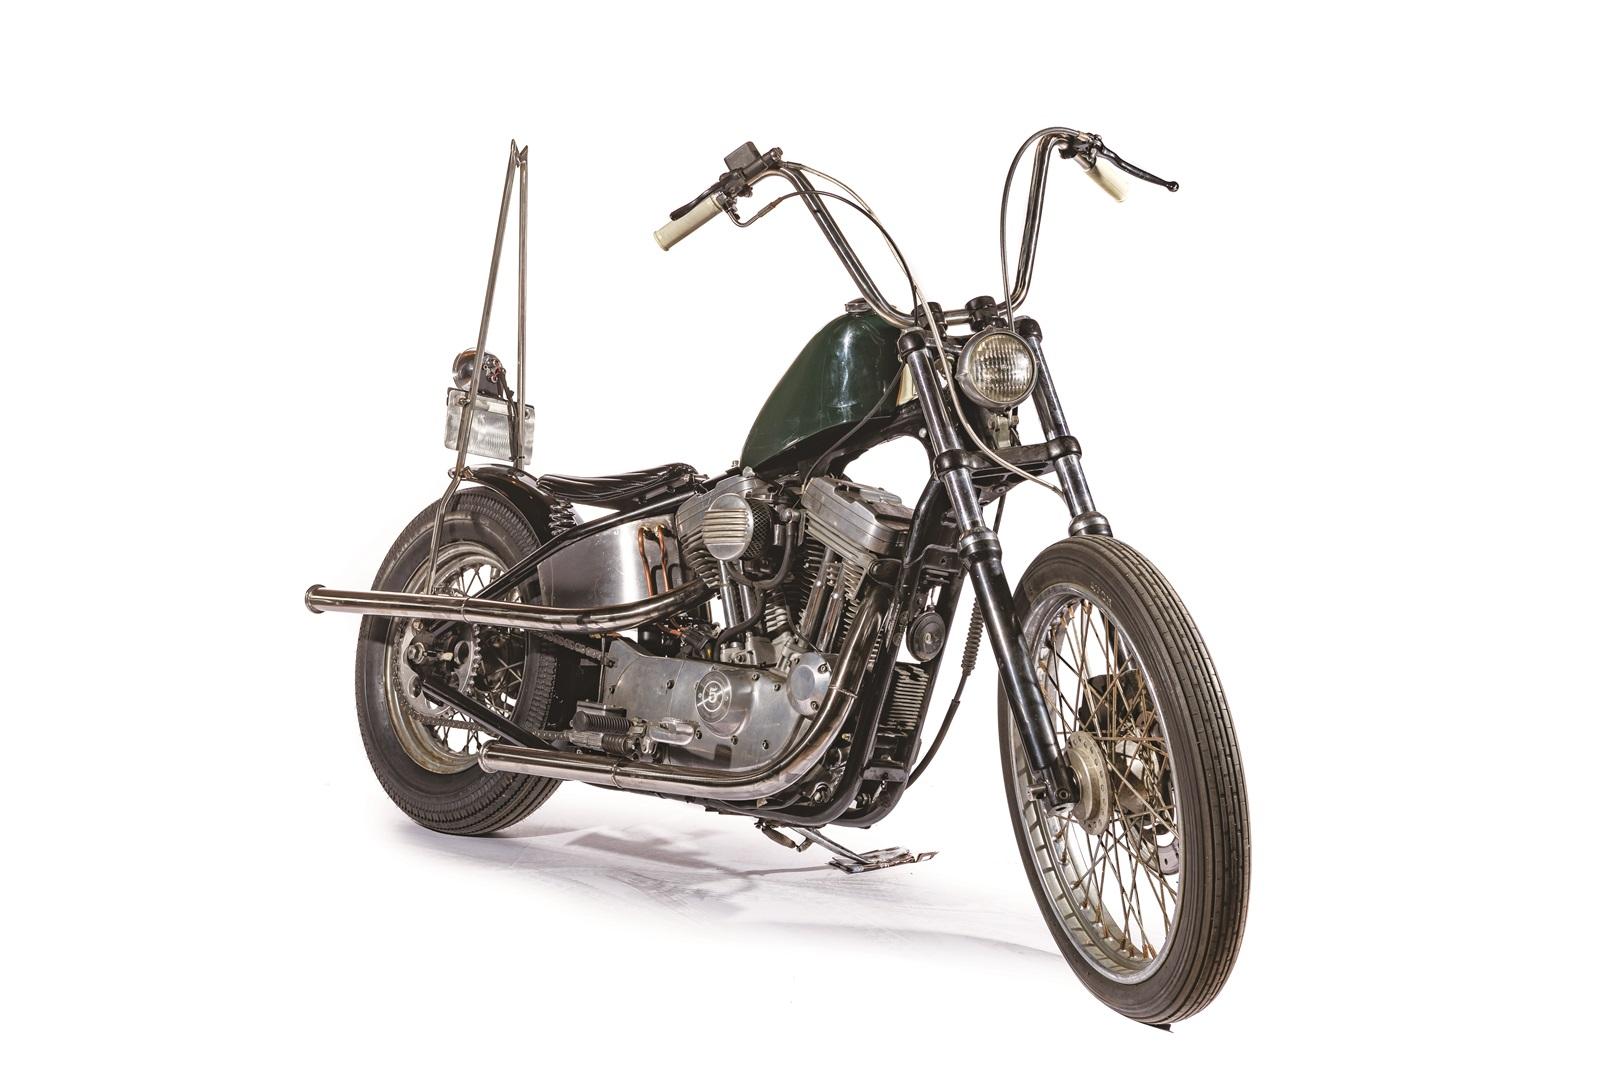 KAYSON MOTORCRAFT